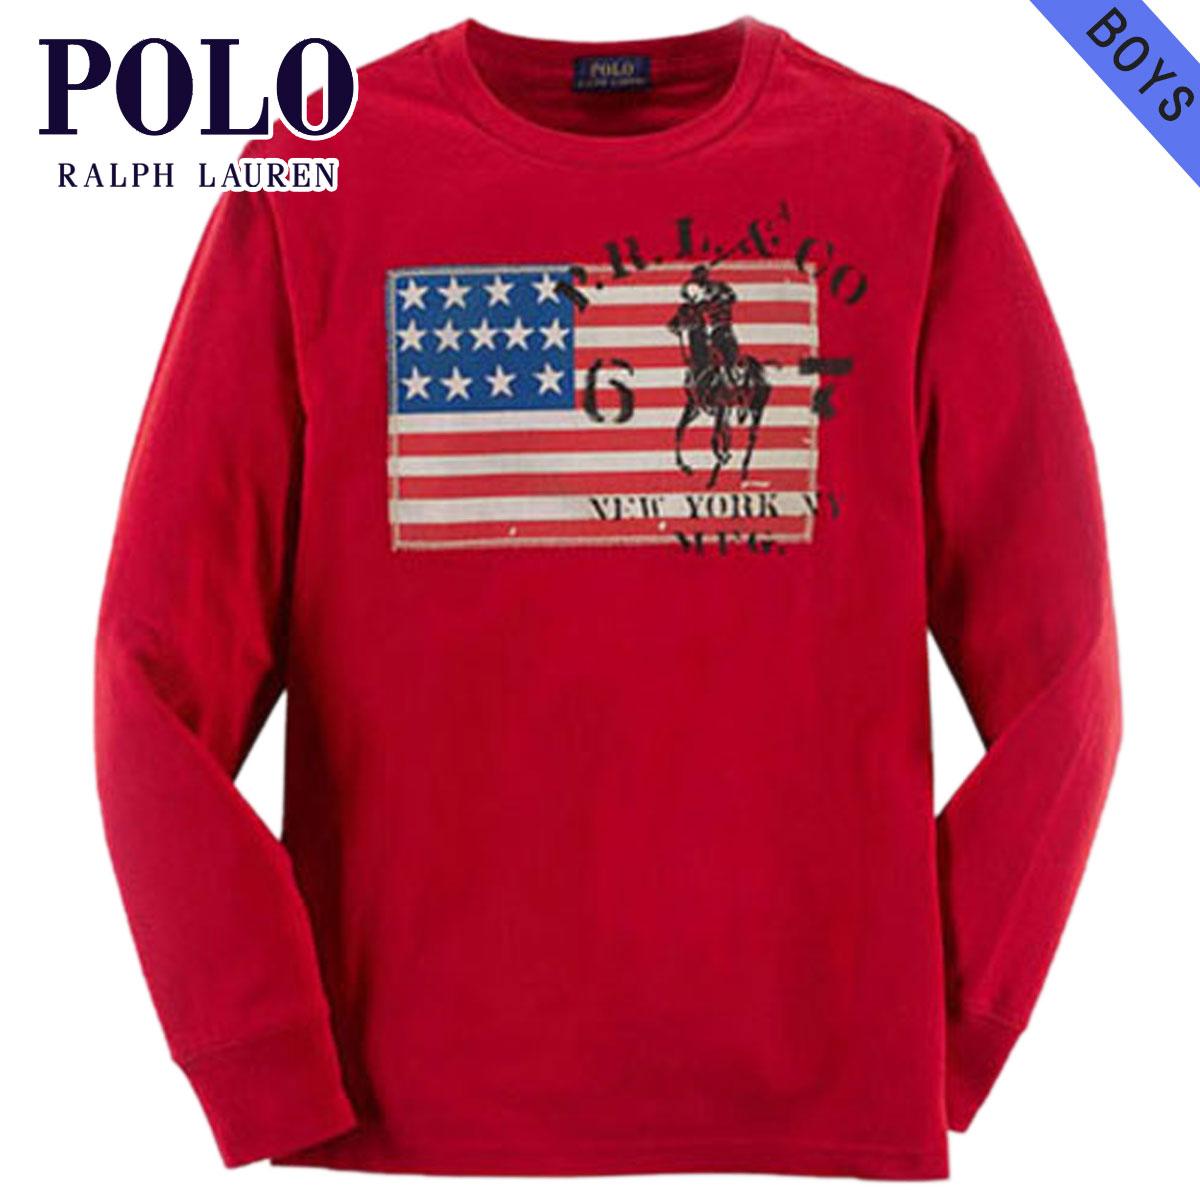 a5796768b502 Poloralflorenkids POLO RALPH LAUREN CHILDREN genuine kids clothes boys long  sleeve T shirt Flag Cotton Tee  37717066 10P11Apr15